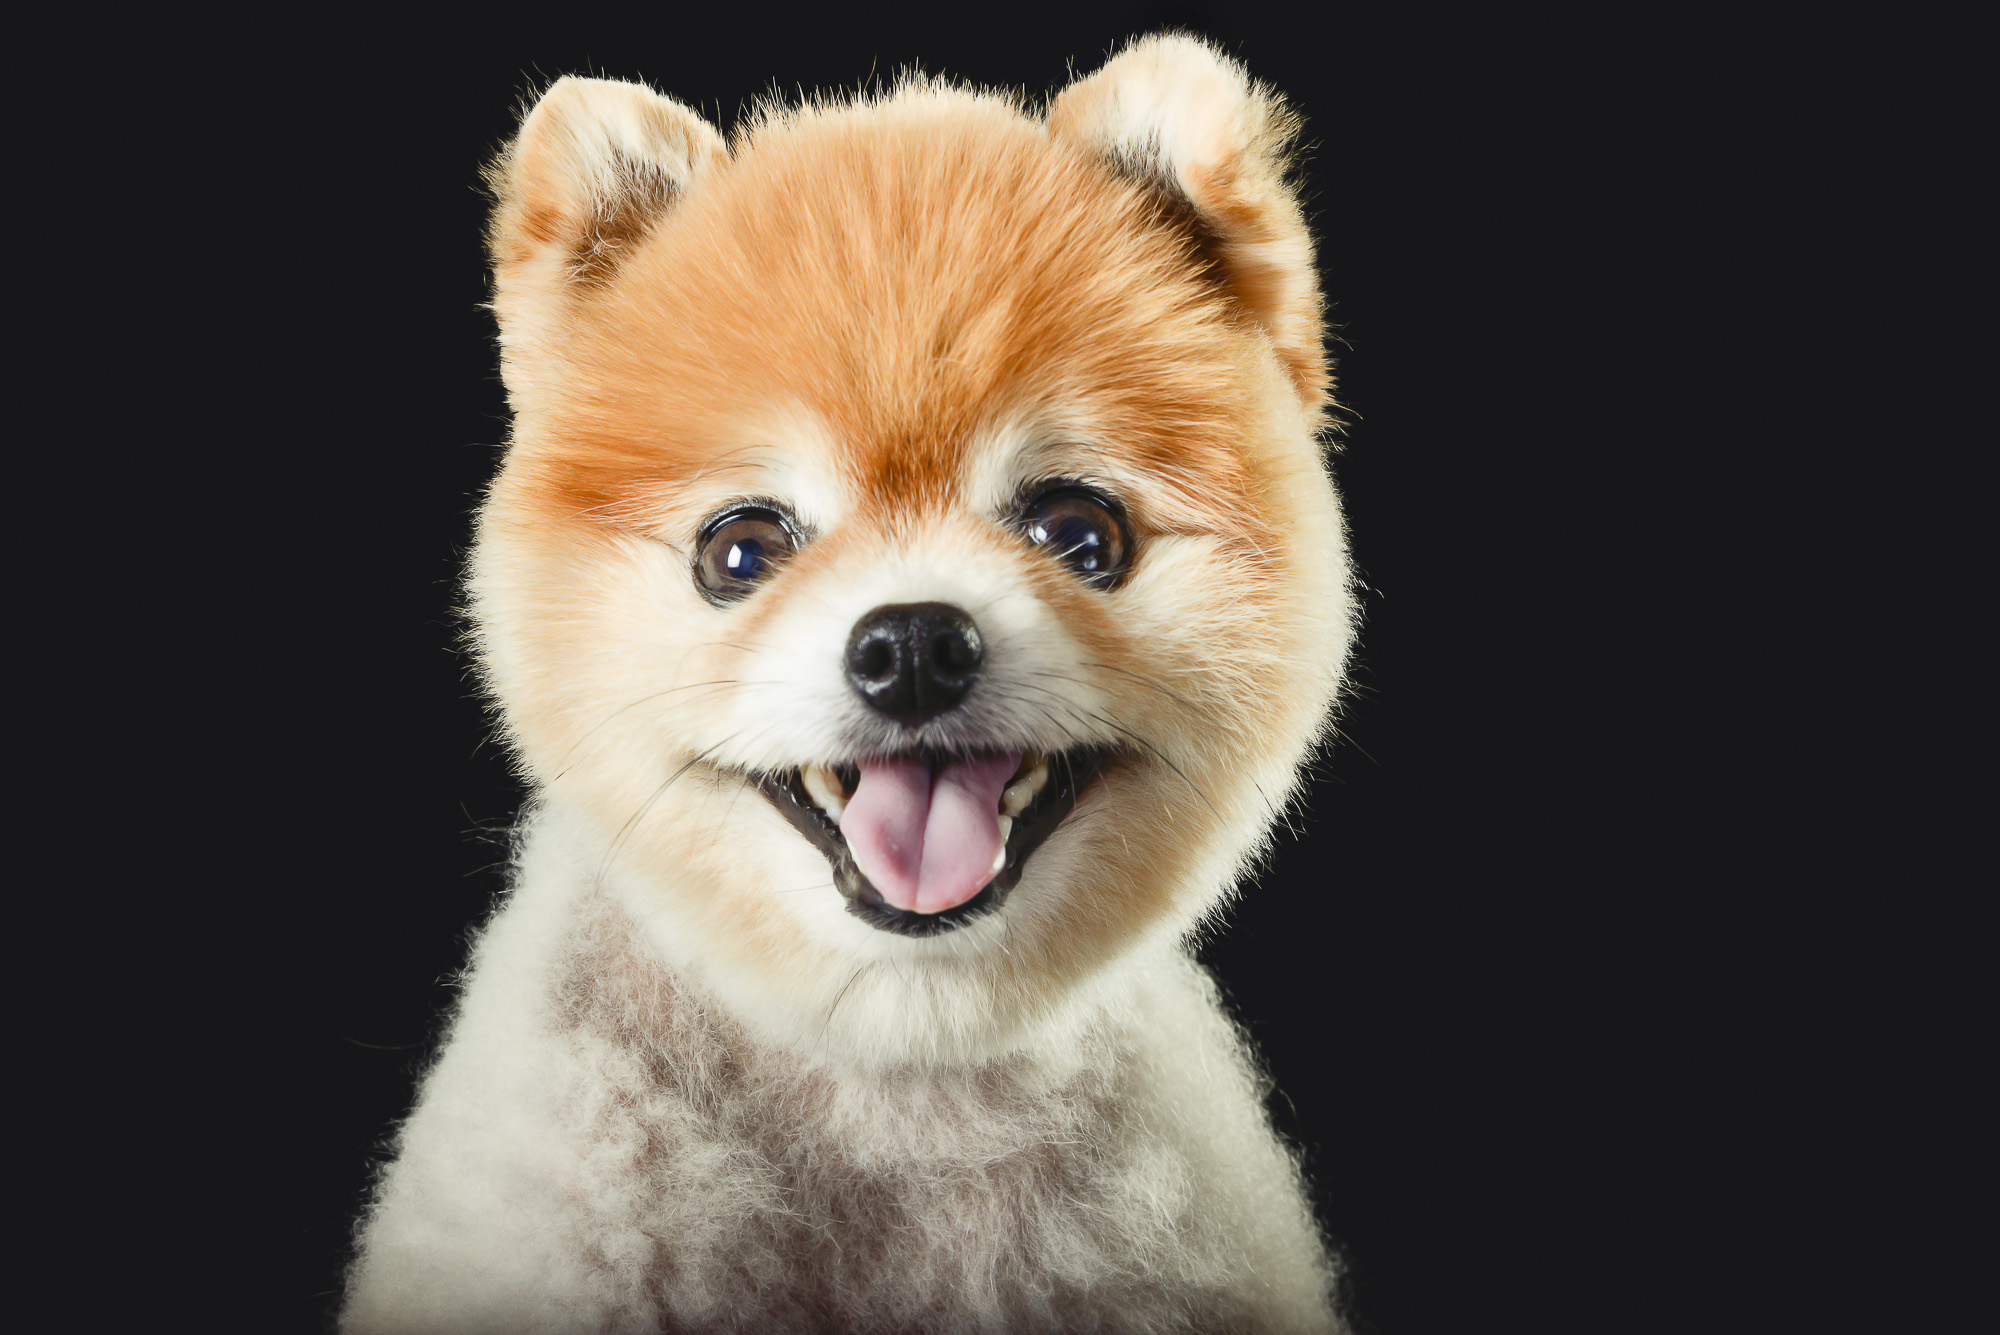 LupinBay_Dog_Pet_Photography_Pomeranian_0168_6505.jpg